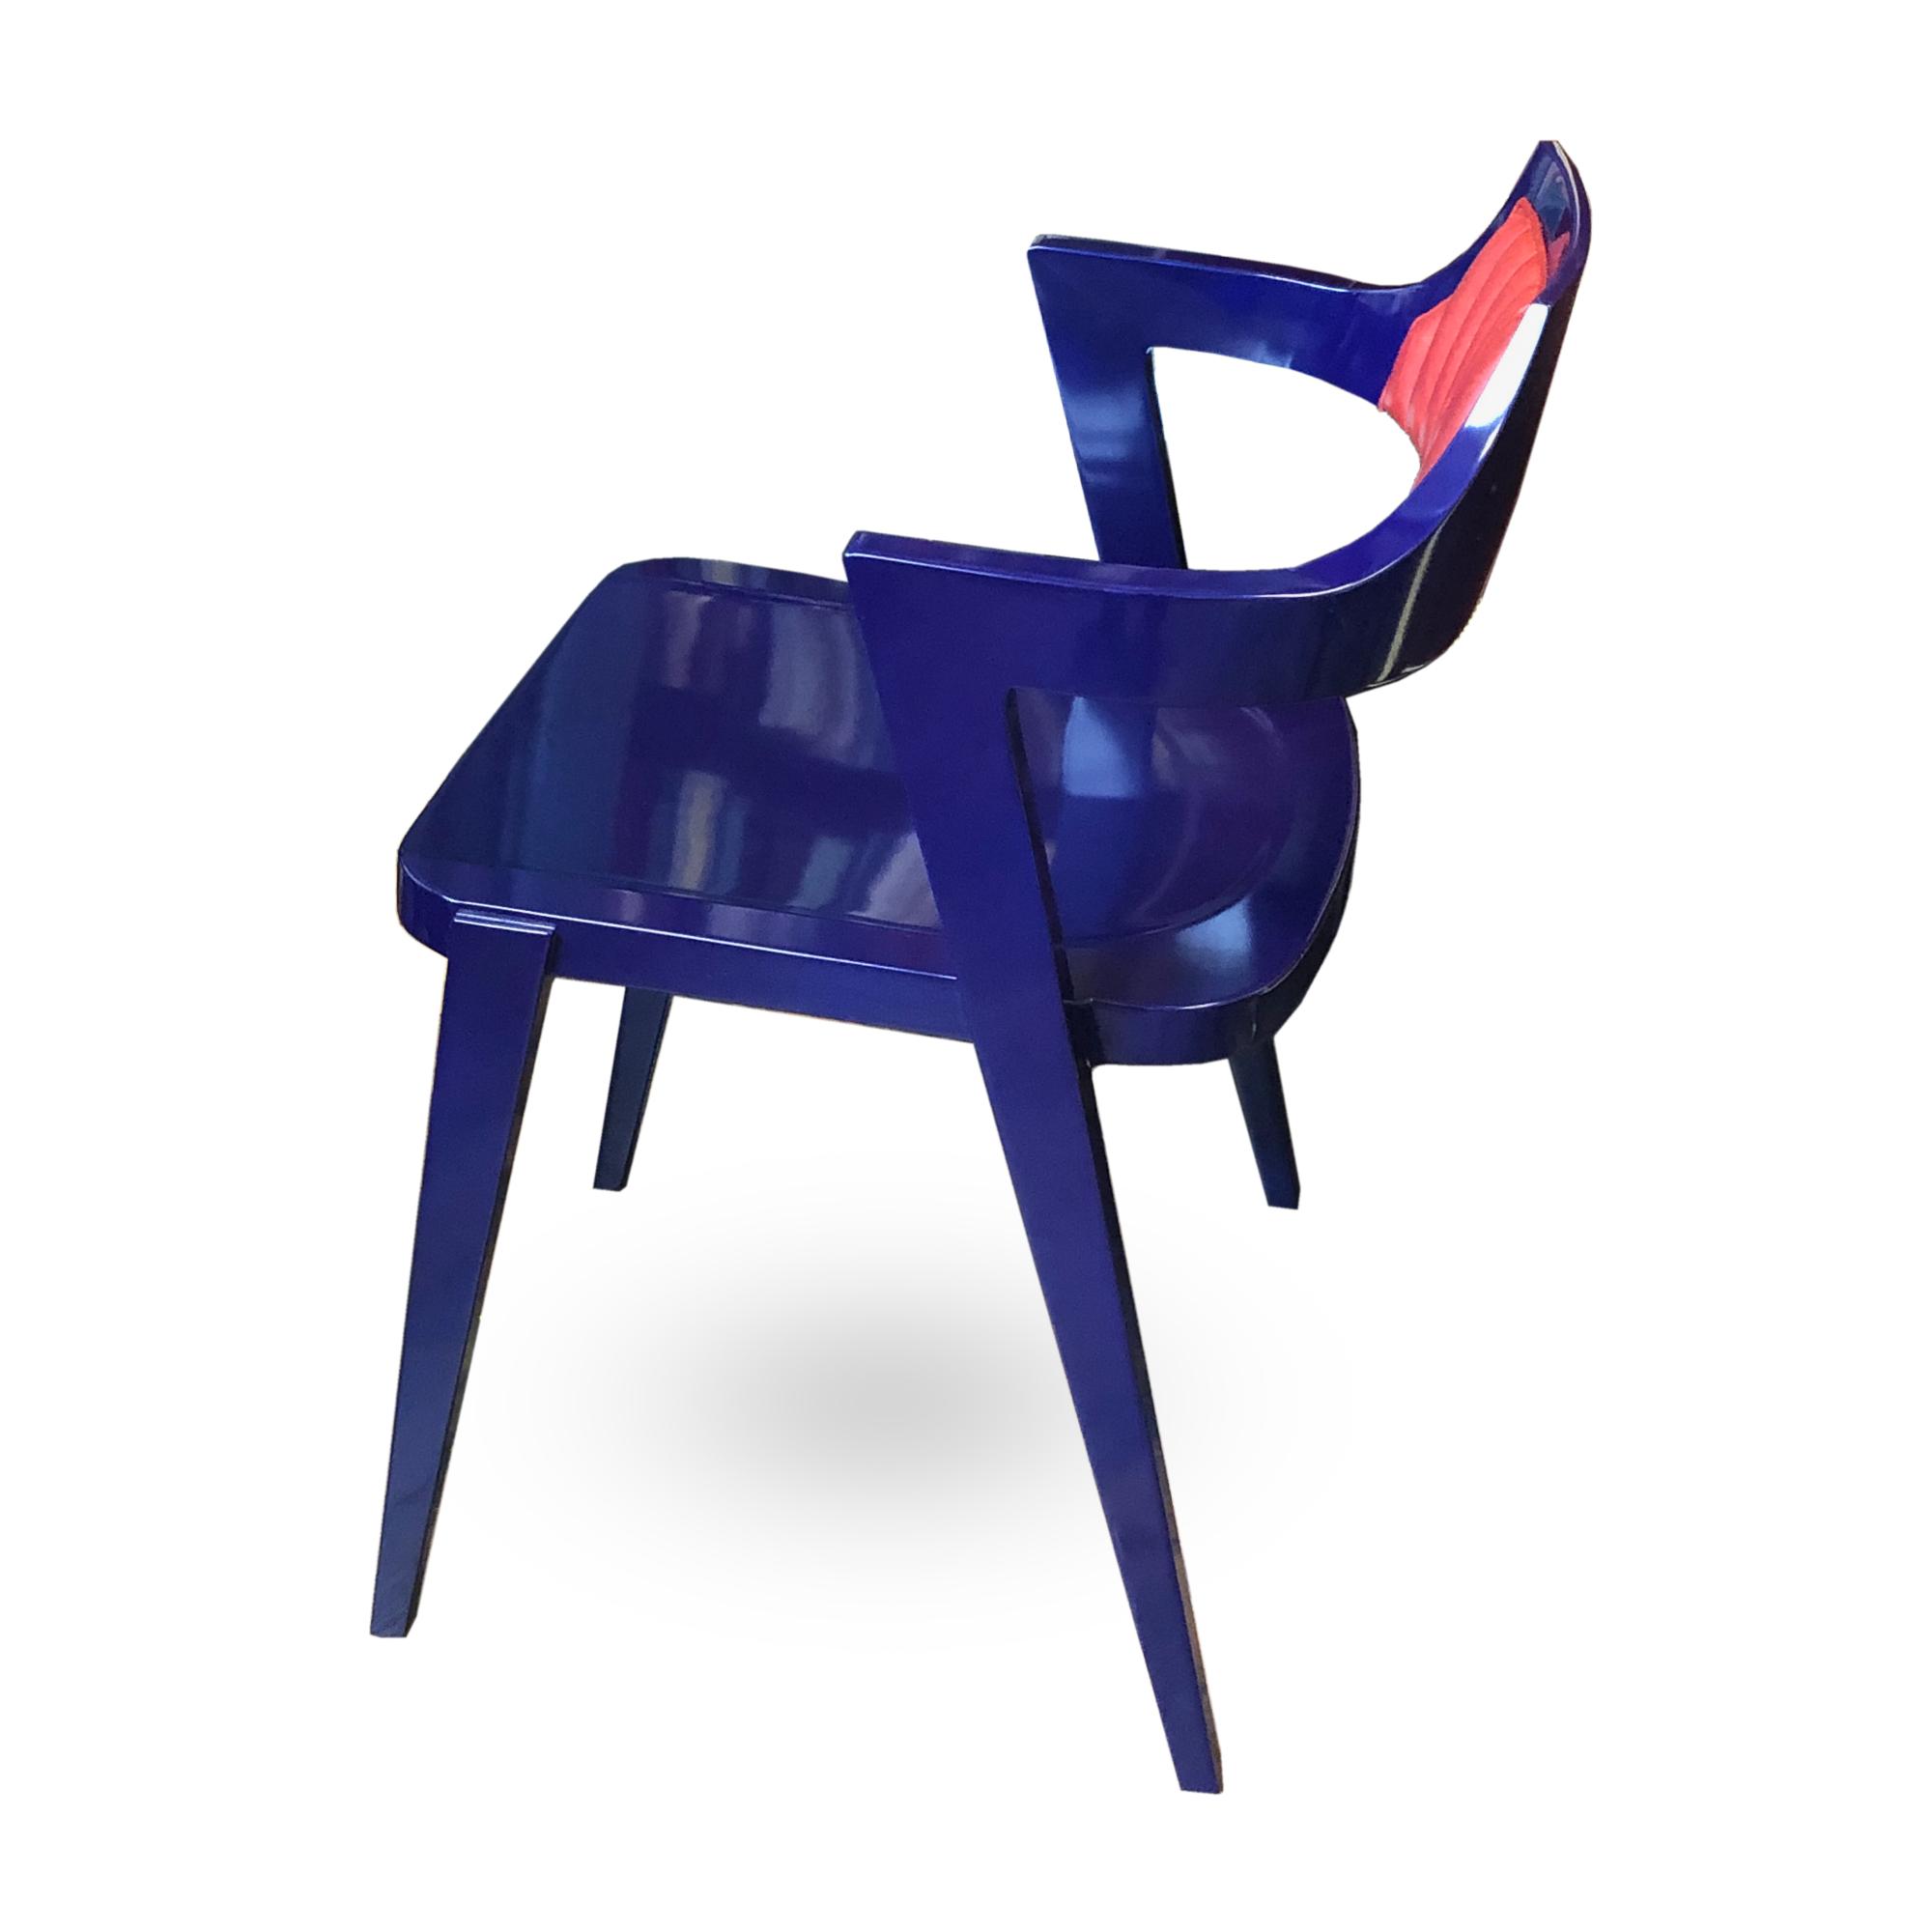 R813-ink-blue-stalking-chair-leather-upholstery-nailhead-trim-modern-design-Victoria&Son-custom-furniture.jpg